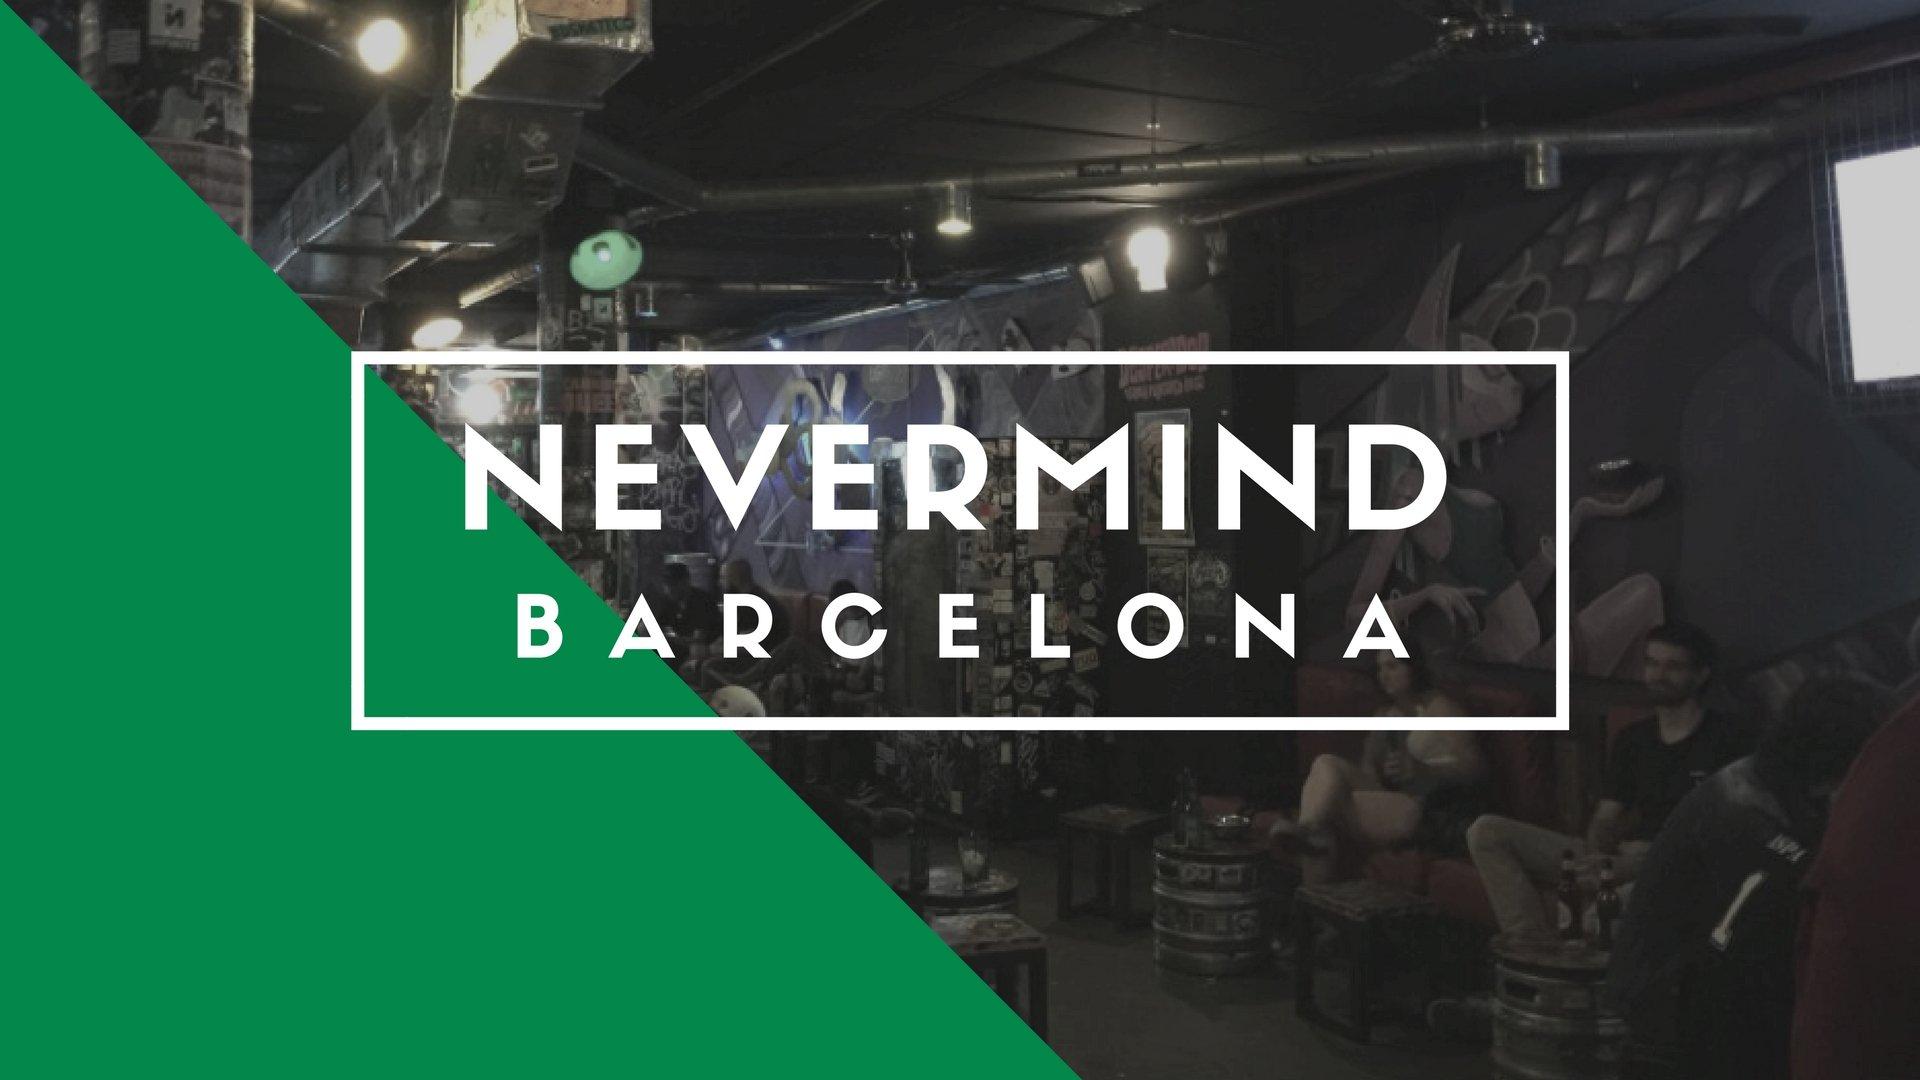 Nevermind, Barcelona